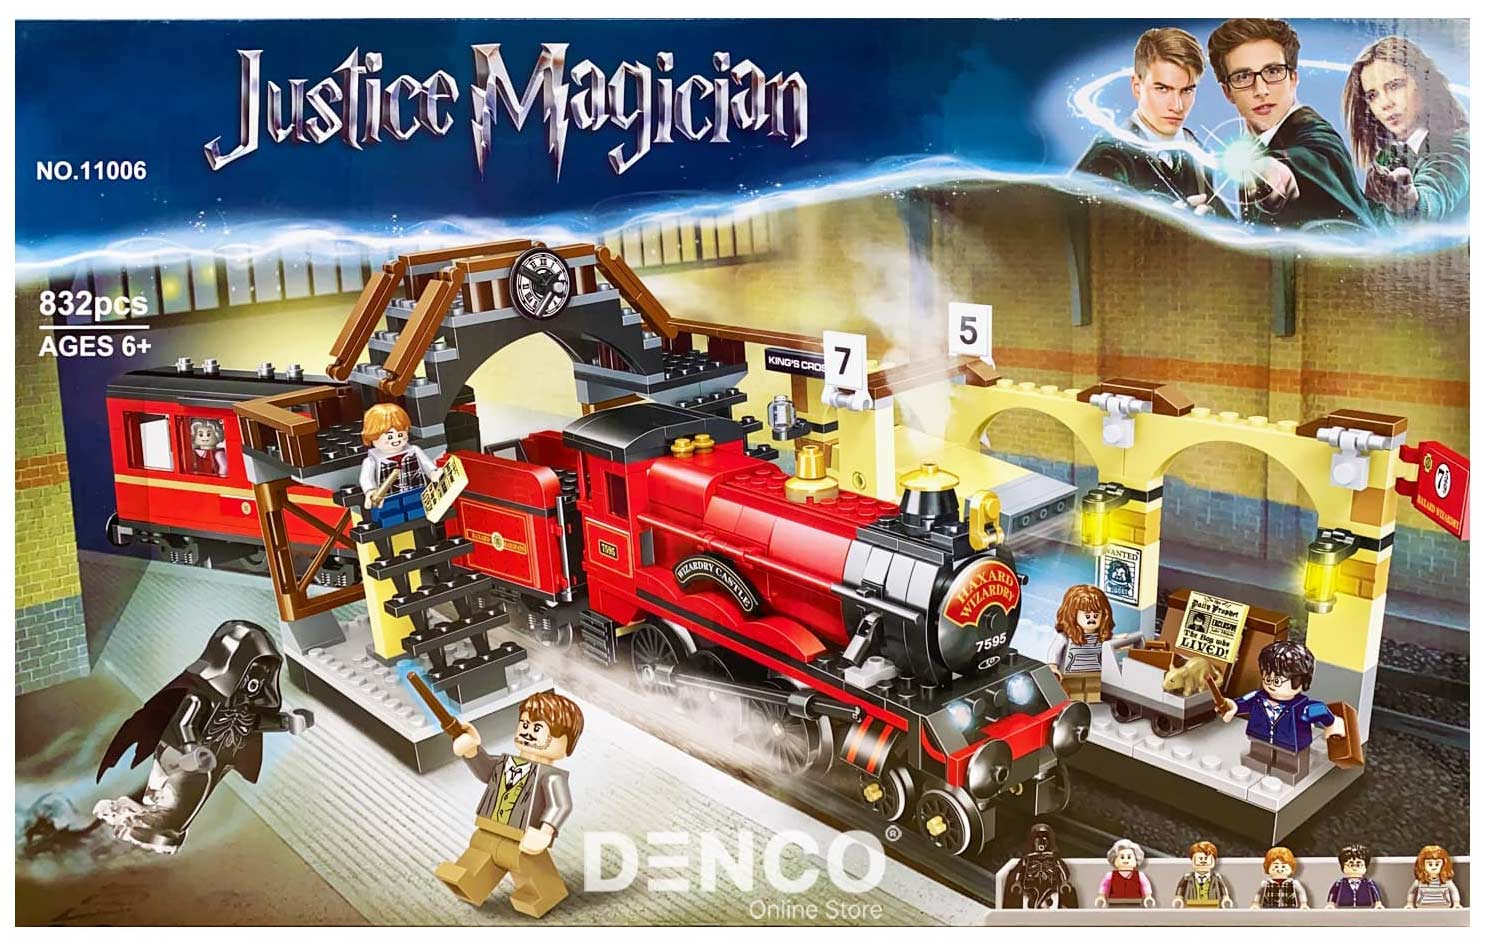 Конструктор «Хогвартс-экспресс» 11006 (Harry Potter 75955) / 832 детали